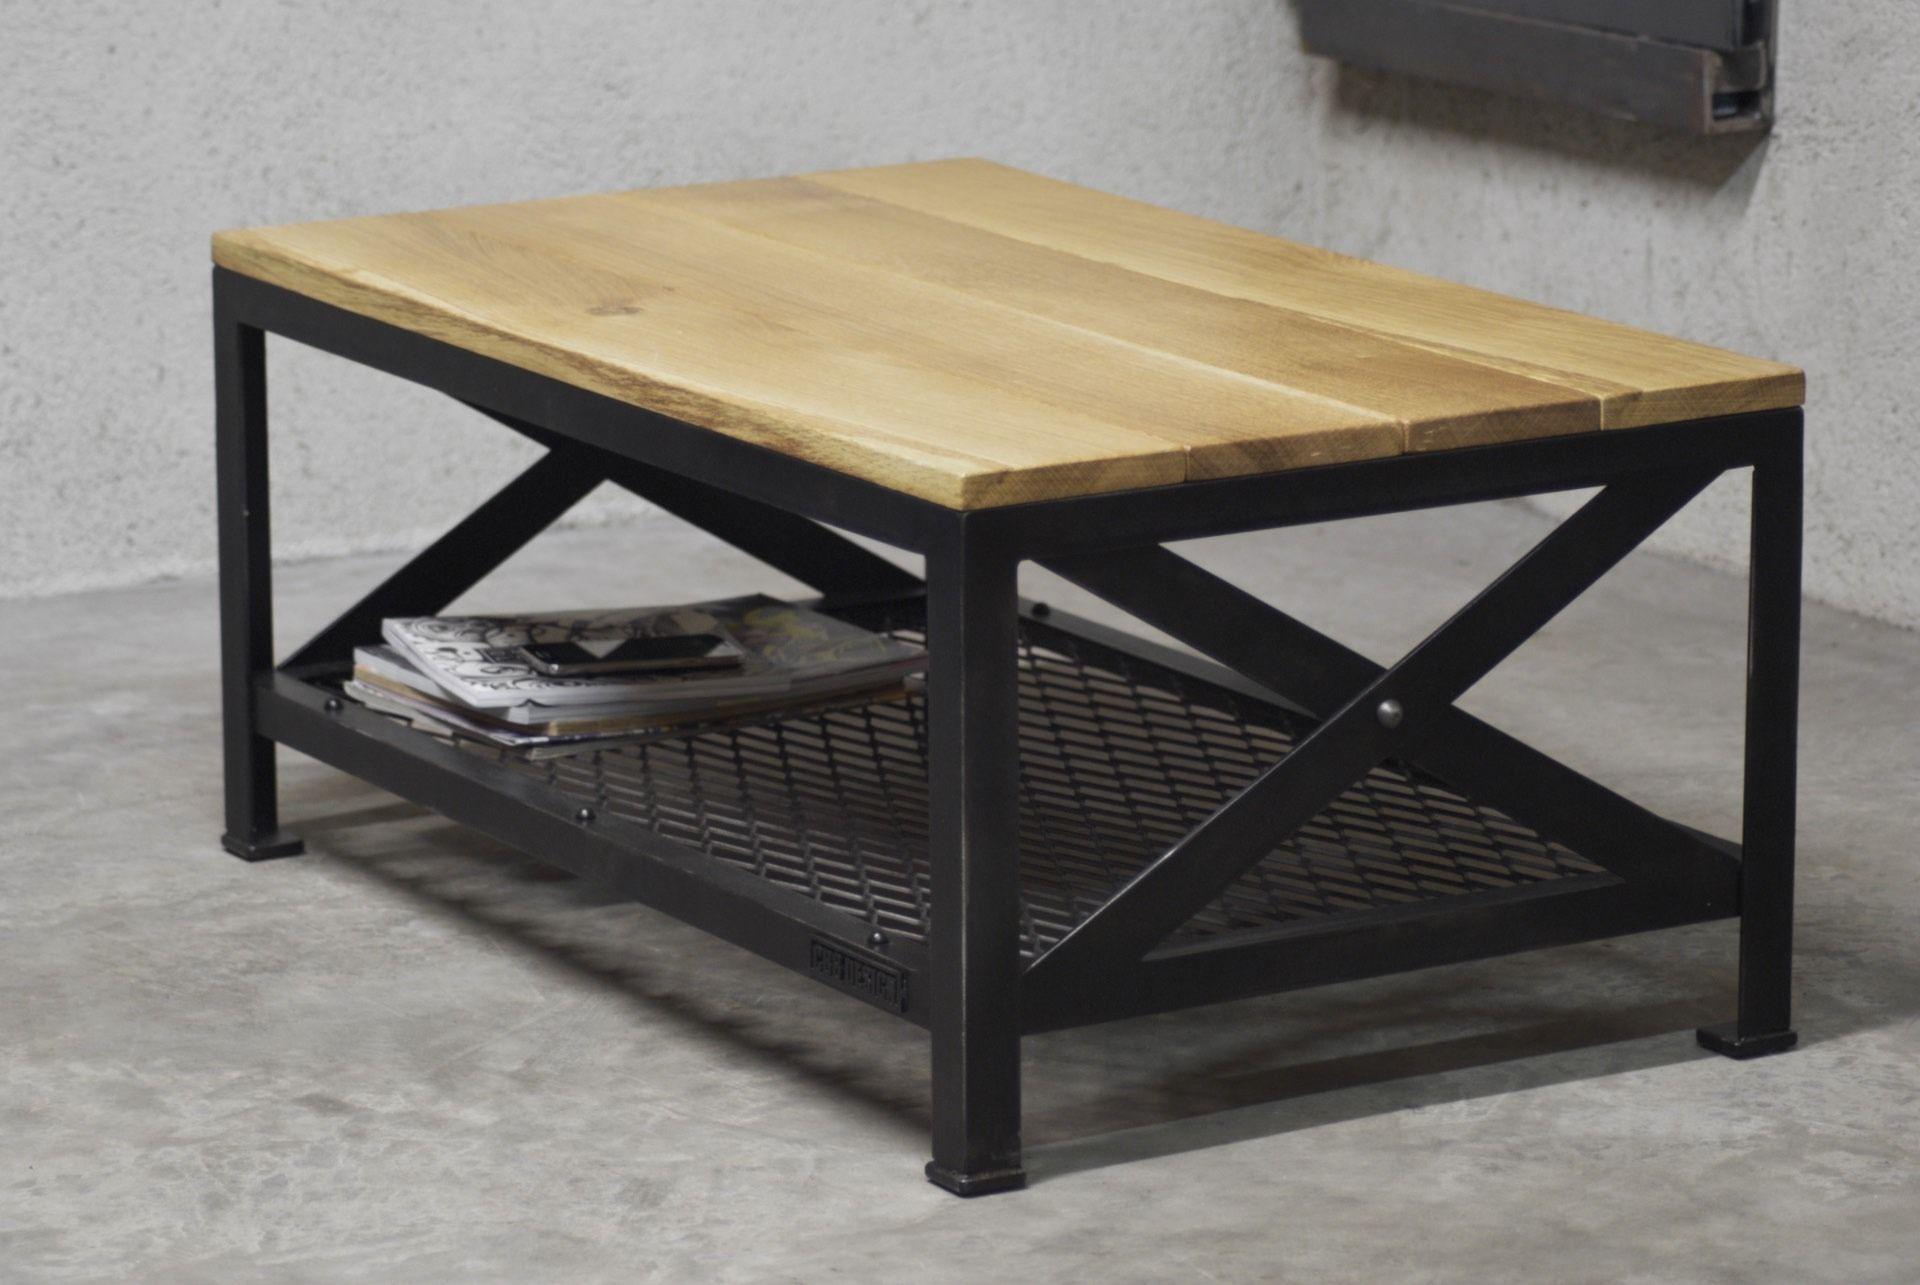 Table basse industrielle Acier & Chªne Mod¨le Brooklyn